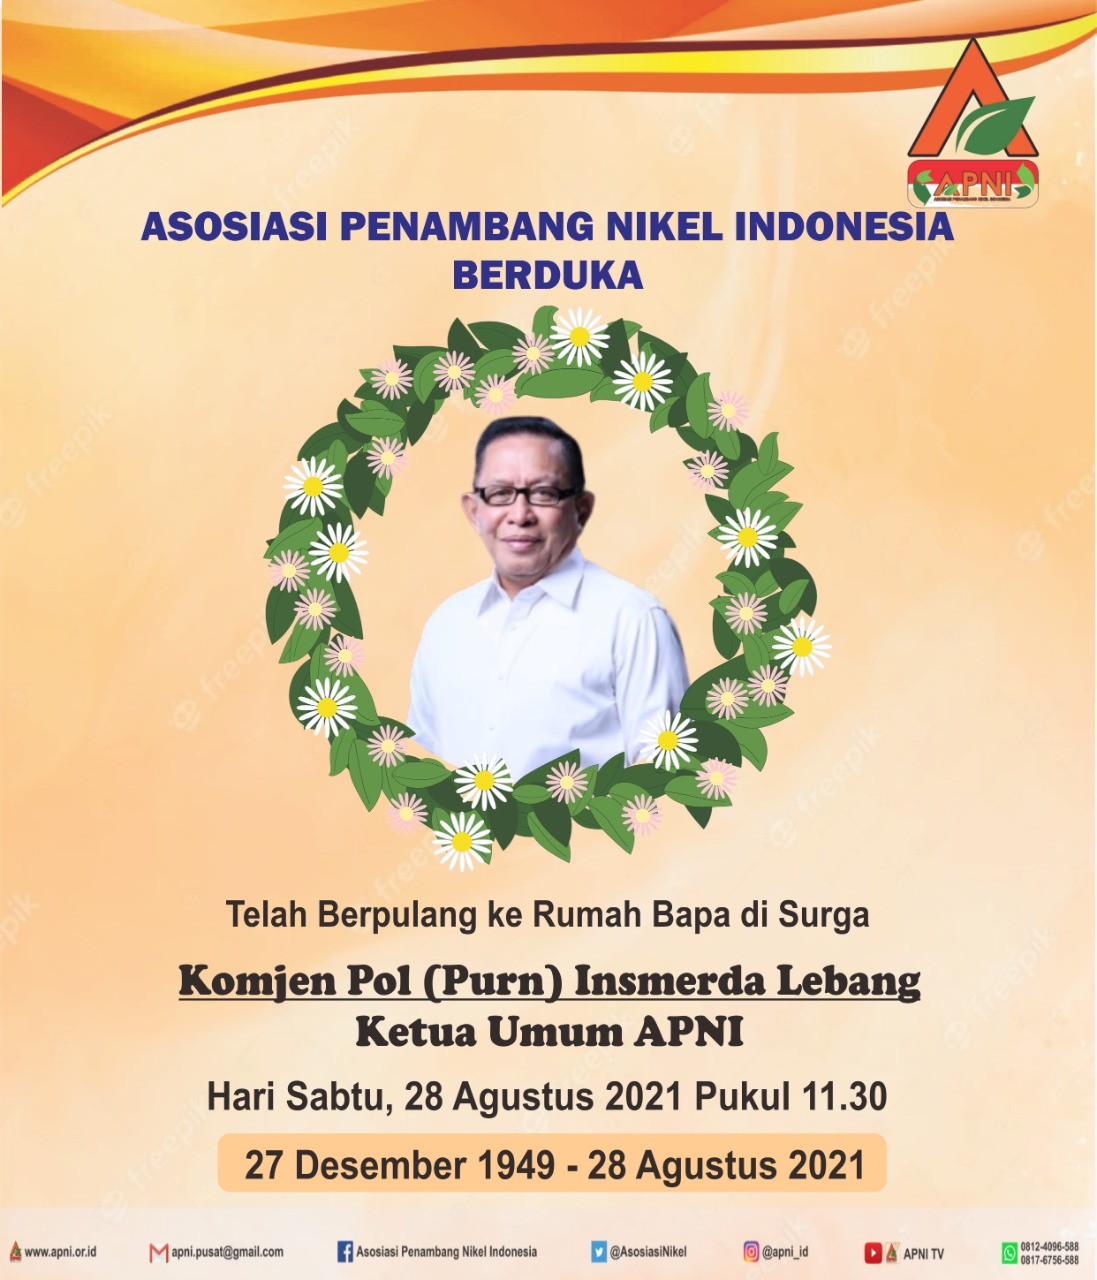 APNI Berduka. Ketua Umum Asosiasi Penambang Nikel Indonesia Berpulang